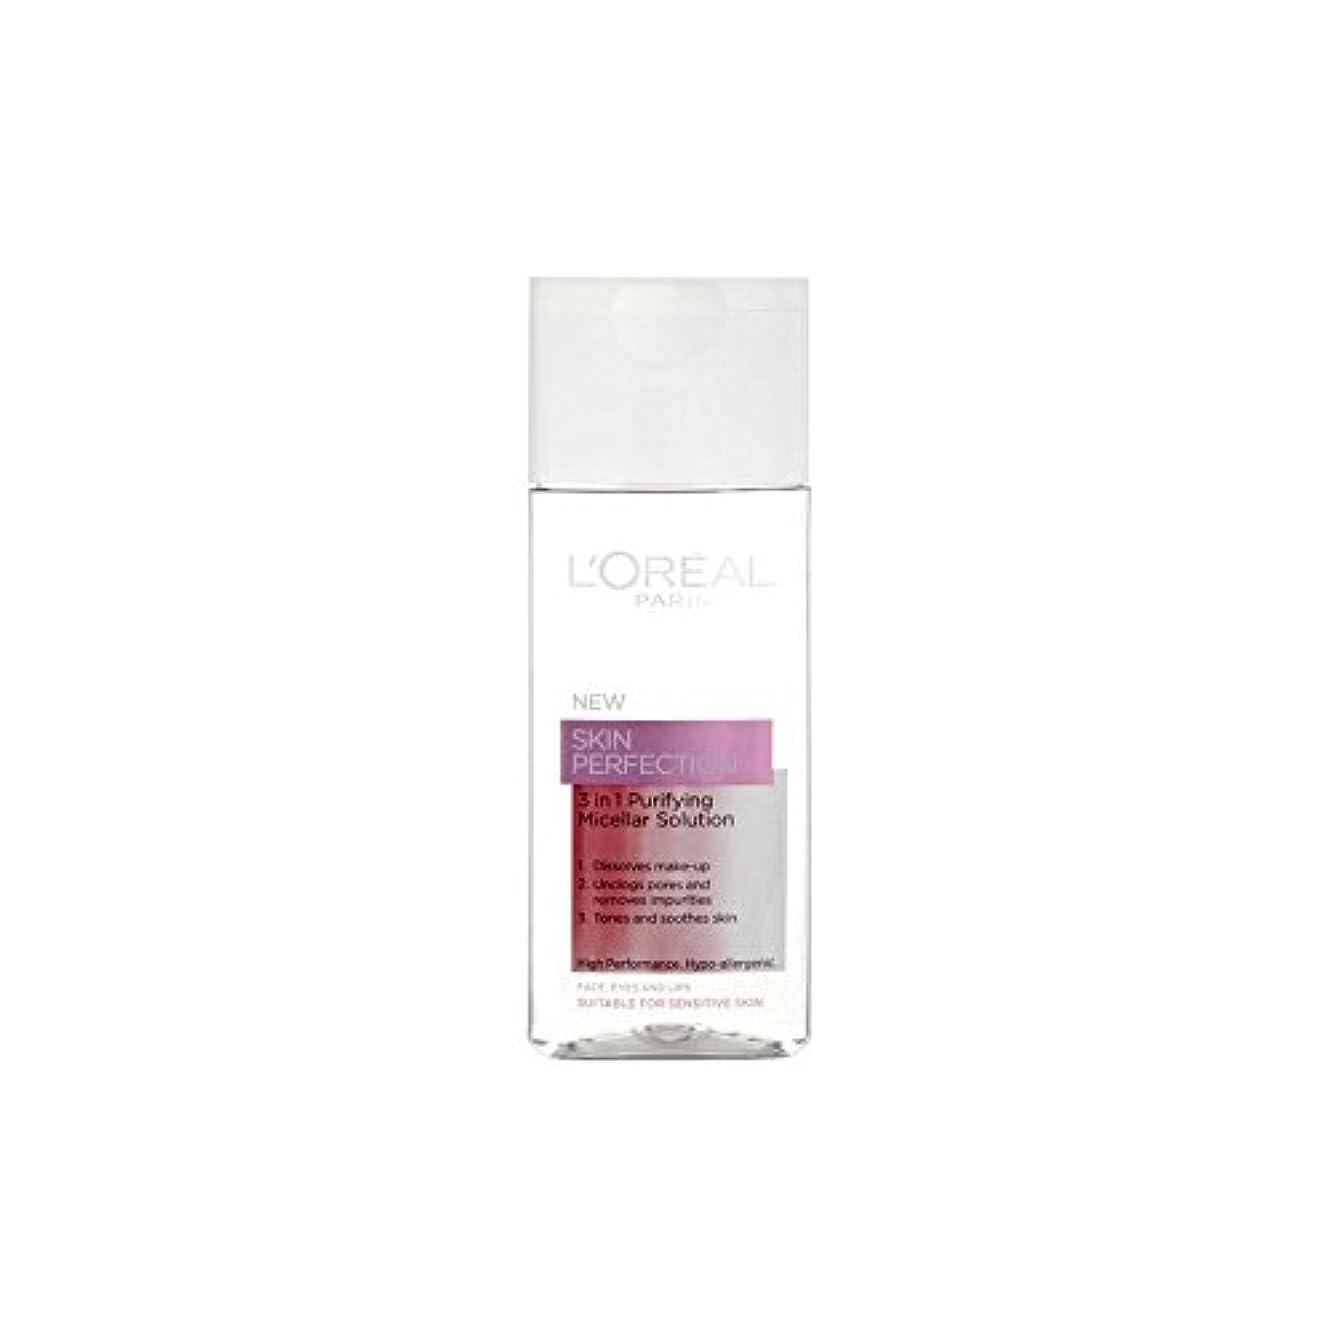 L'Oreal Paris Dermo Expertise Skin Perfection 3 In 1 Purifying Micellar Solution (200ml) (Pack of 6) - 1つの精製ミセル溶液中ロレアルパリ?ダーモ専門知識の皮膚完璧3(200ミリリットル) x6 [並行輸入品]